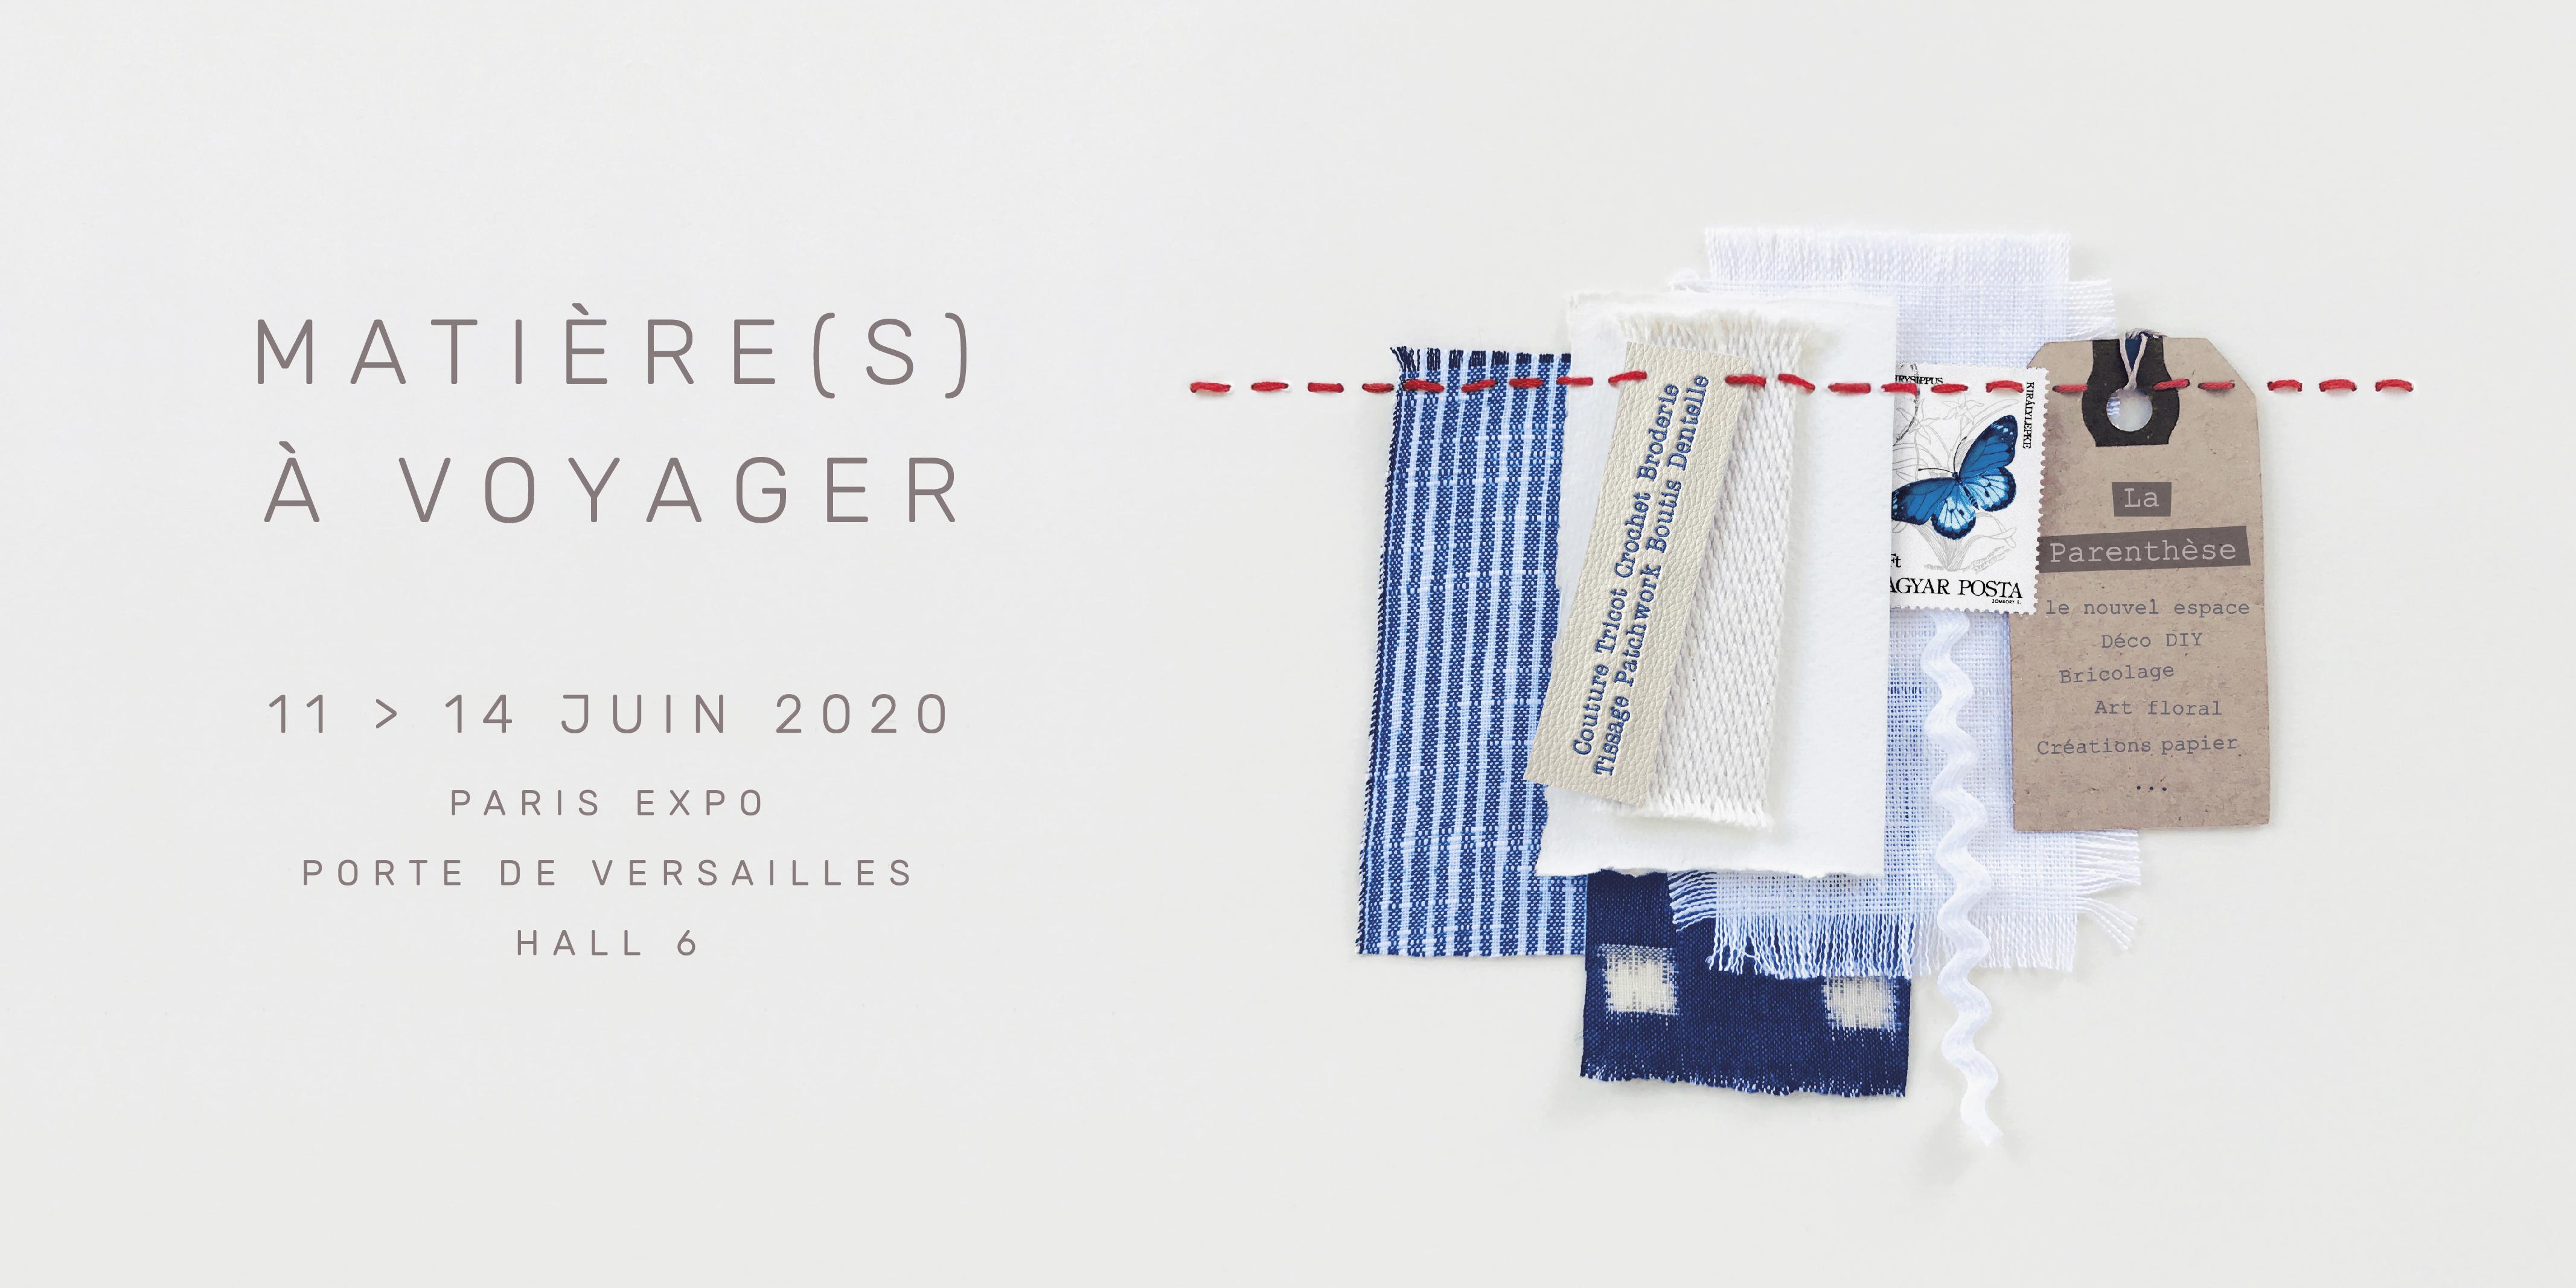 Kit média 2020 Twitter